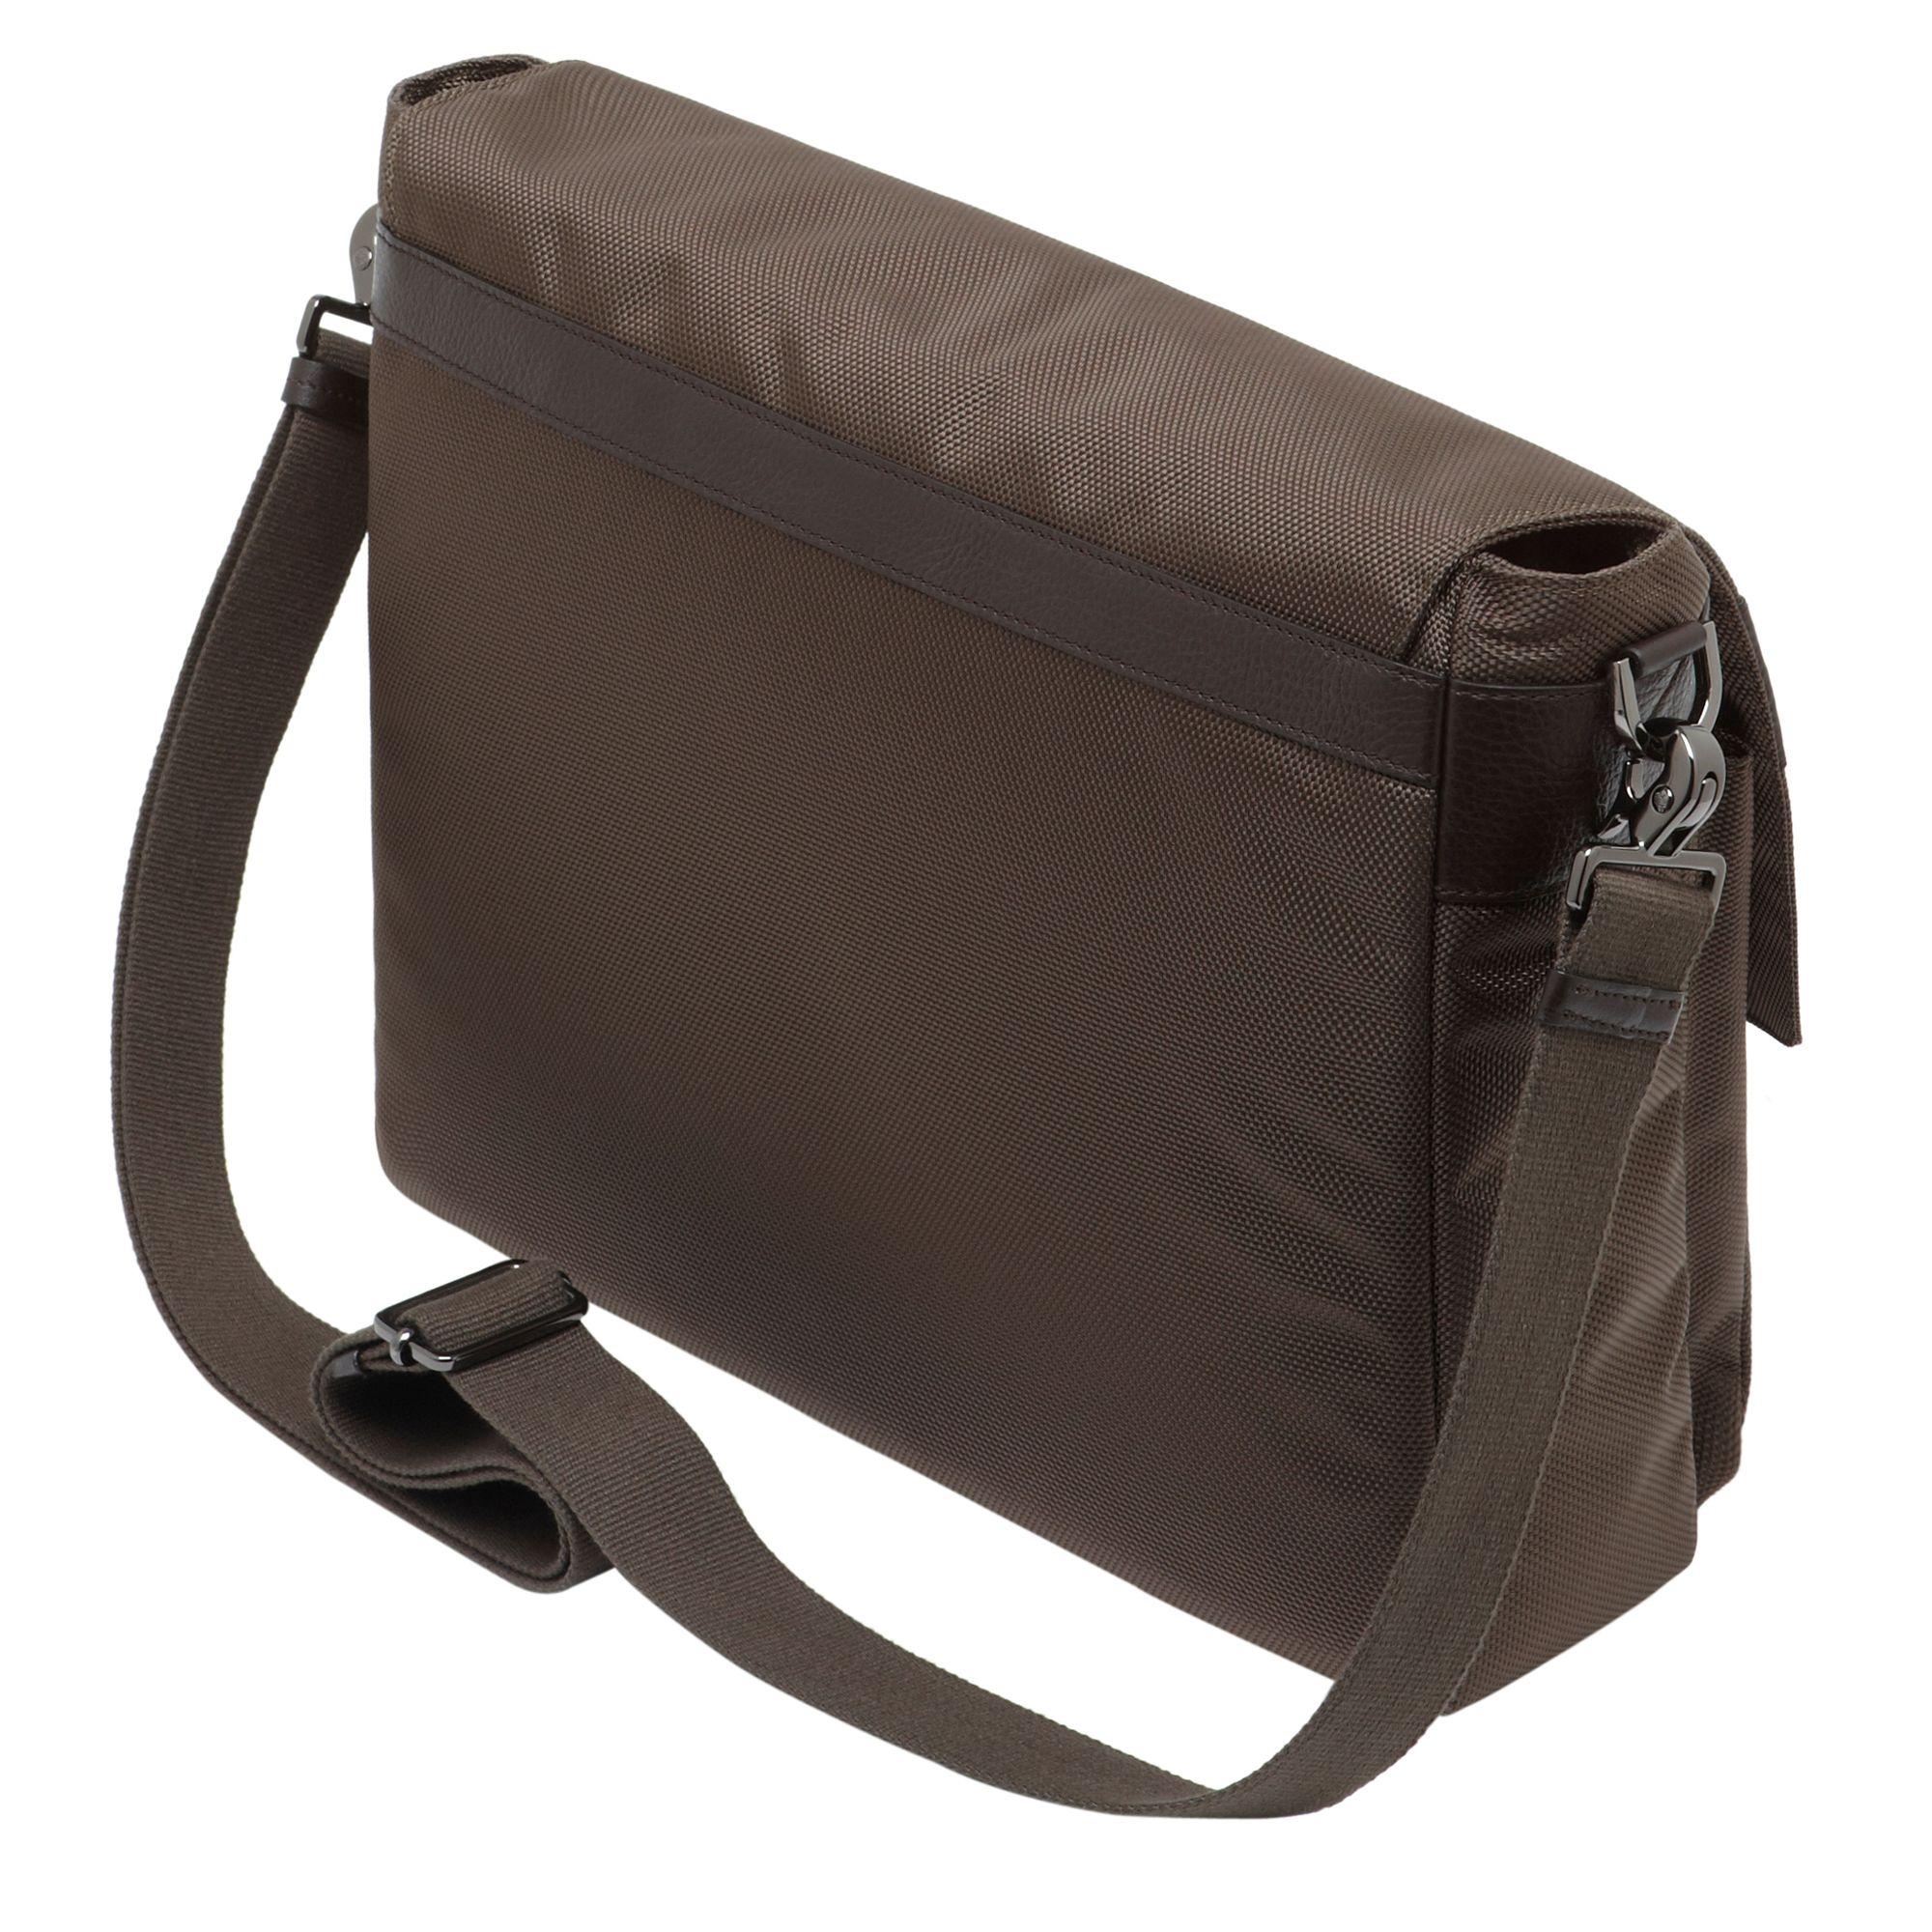 9e6bb8acb78f Mulberry Henry Laptop Messenger Bag in Brown for Men - Lyst